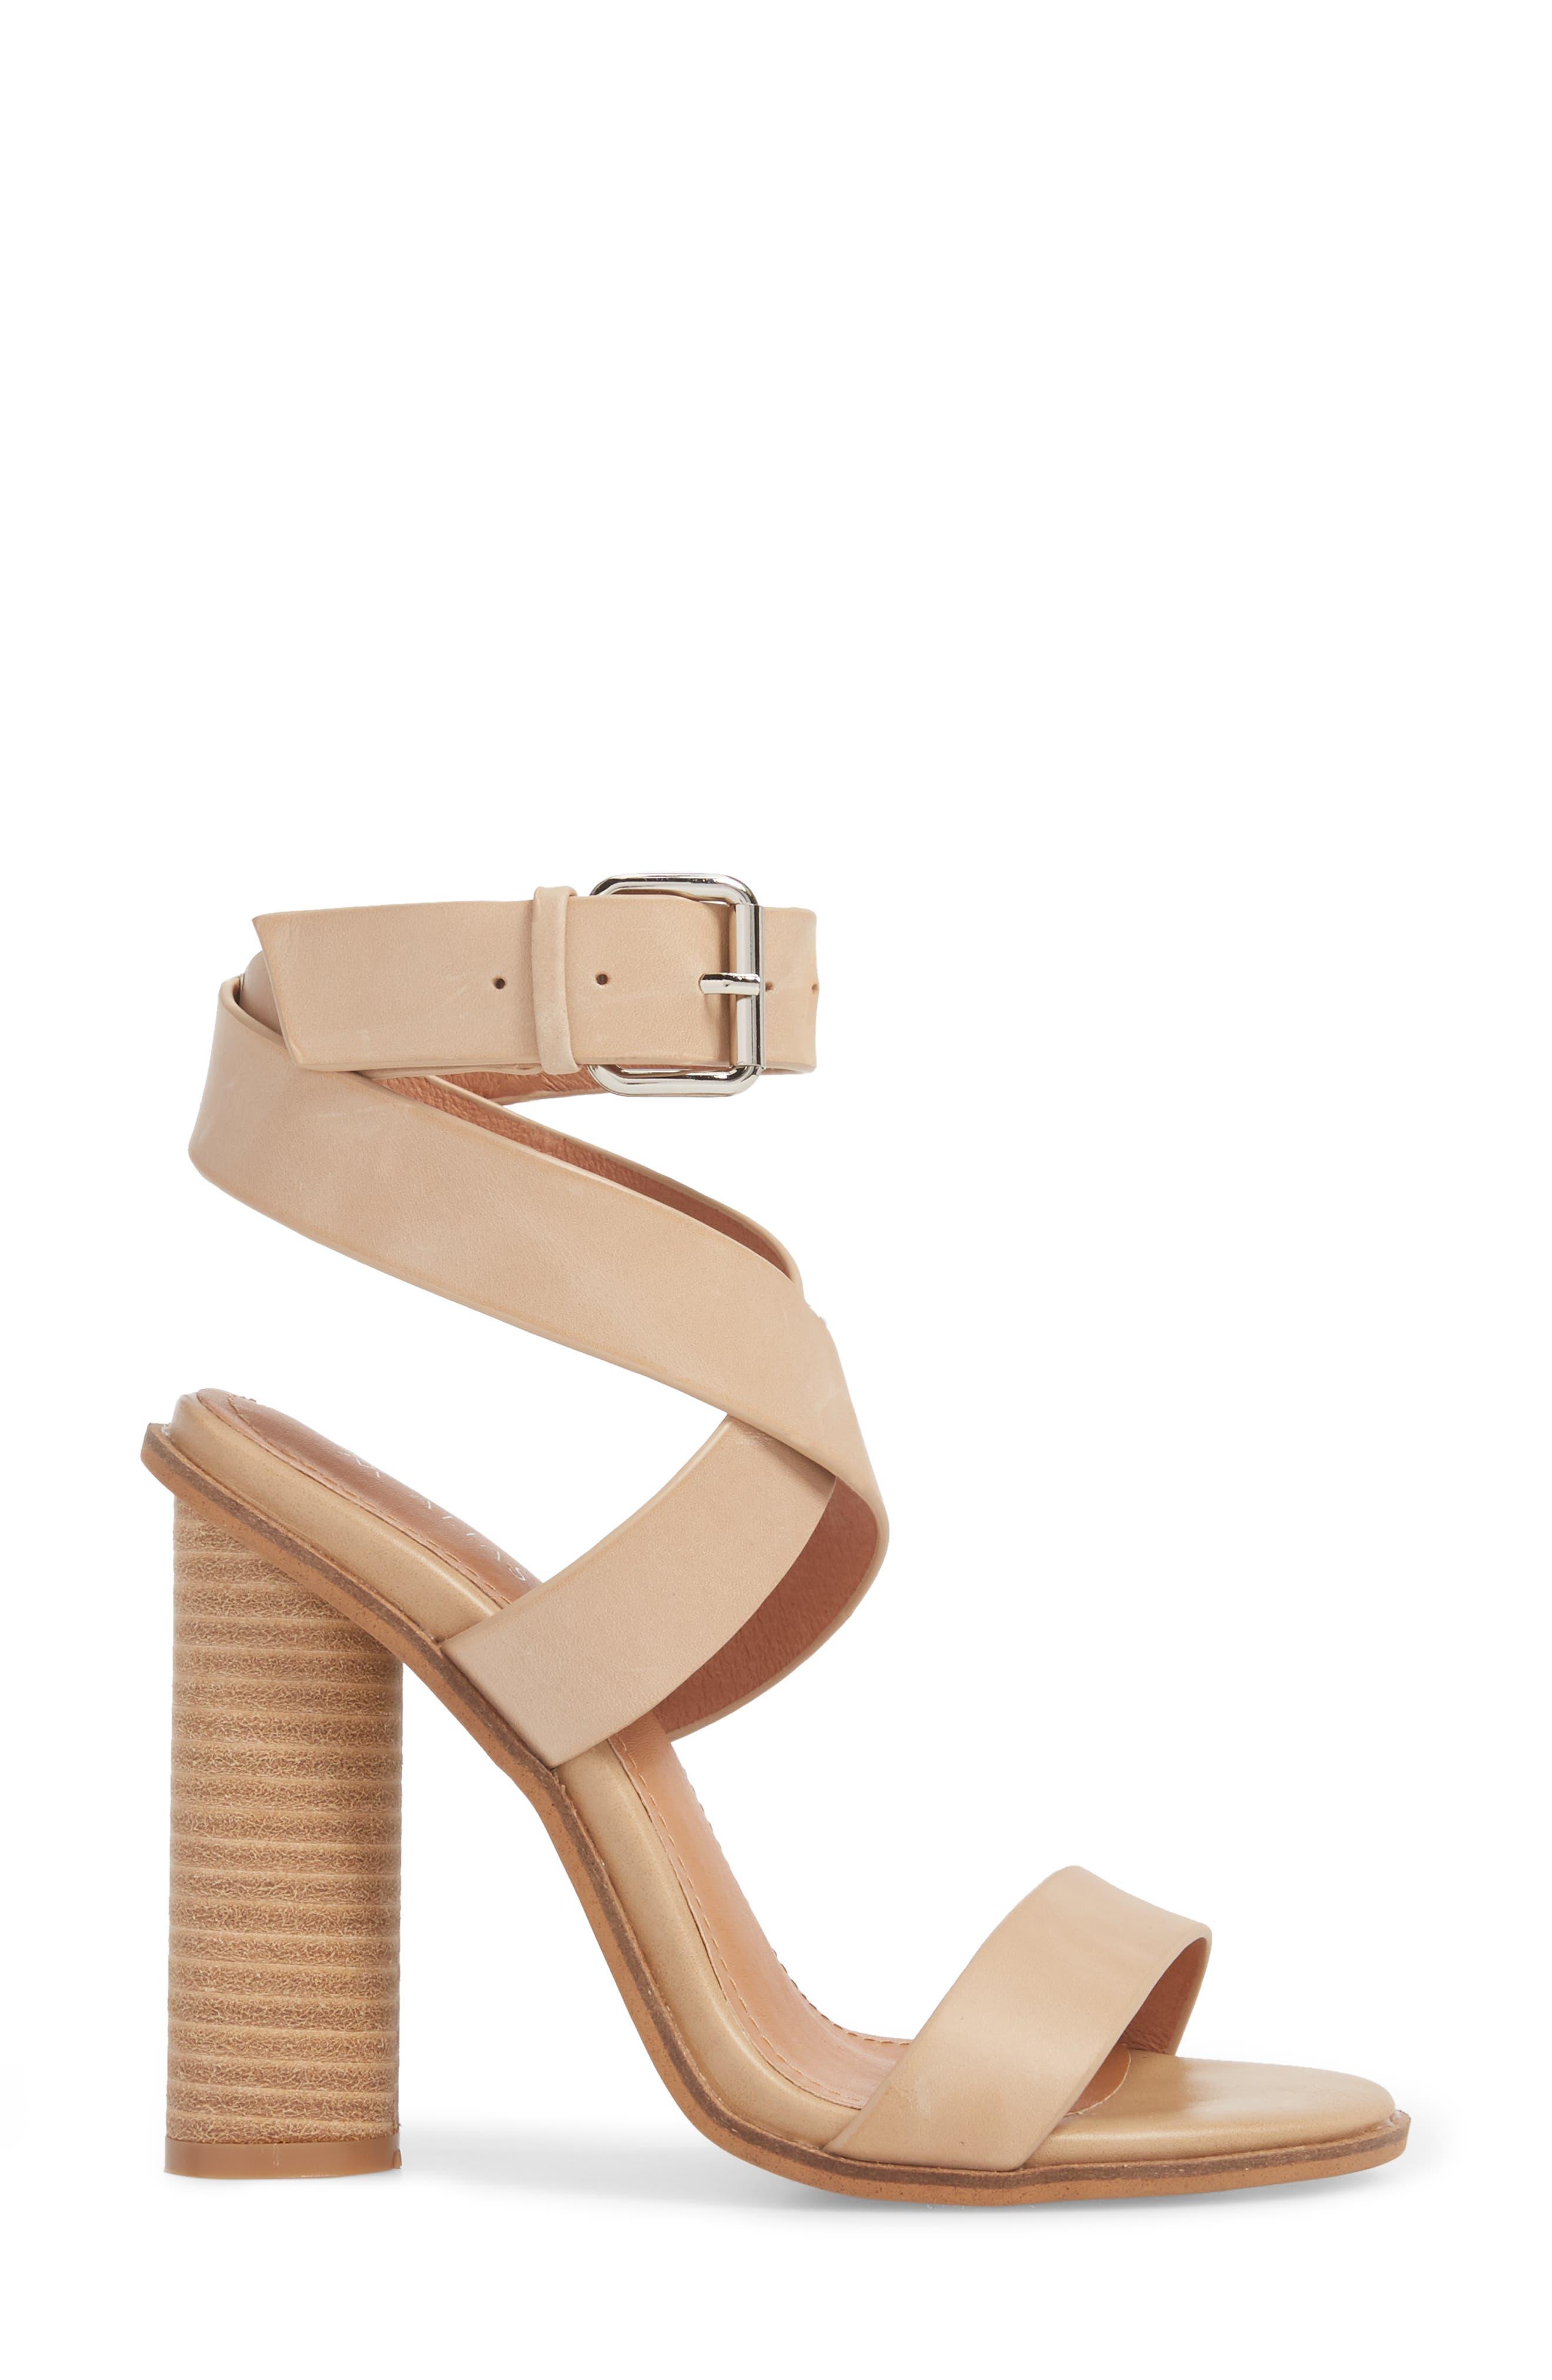 Abaala Cross Strap Sandal,                             Alternate thumbnail 3, color,                             Natural Leather